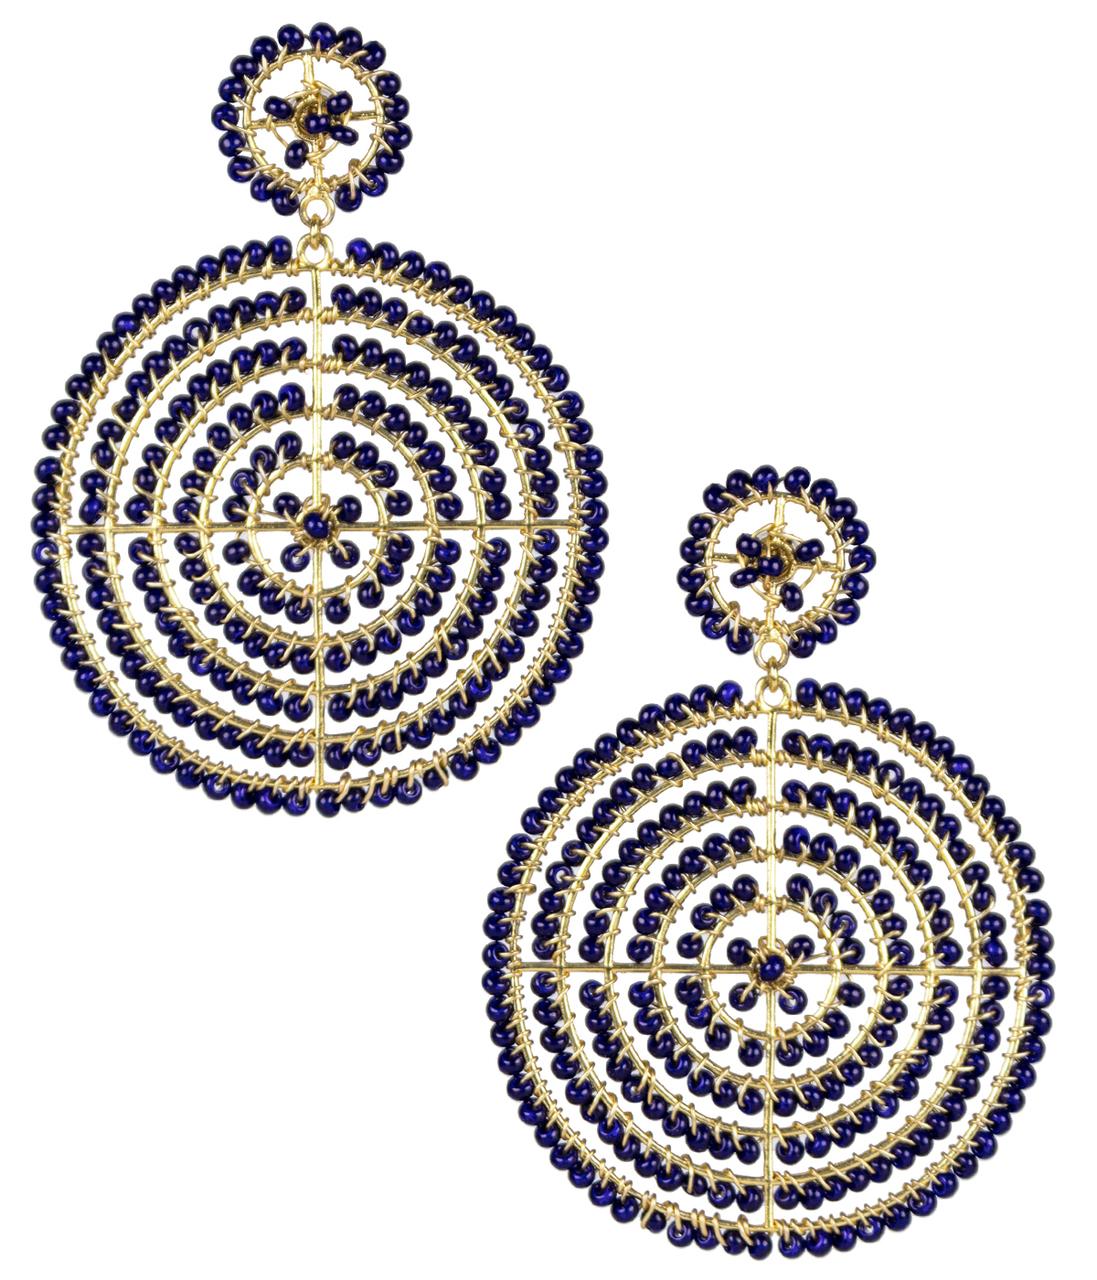 Disk Navy Earrings by LISI LERCH